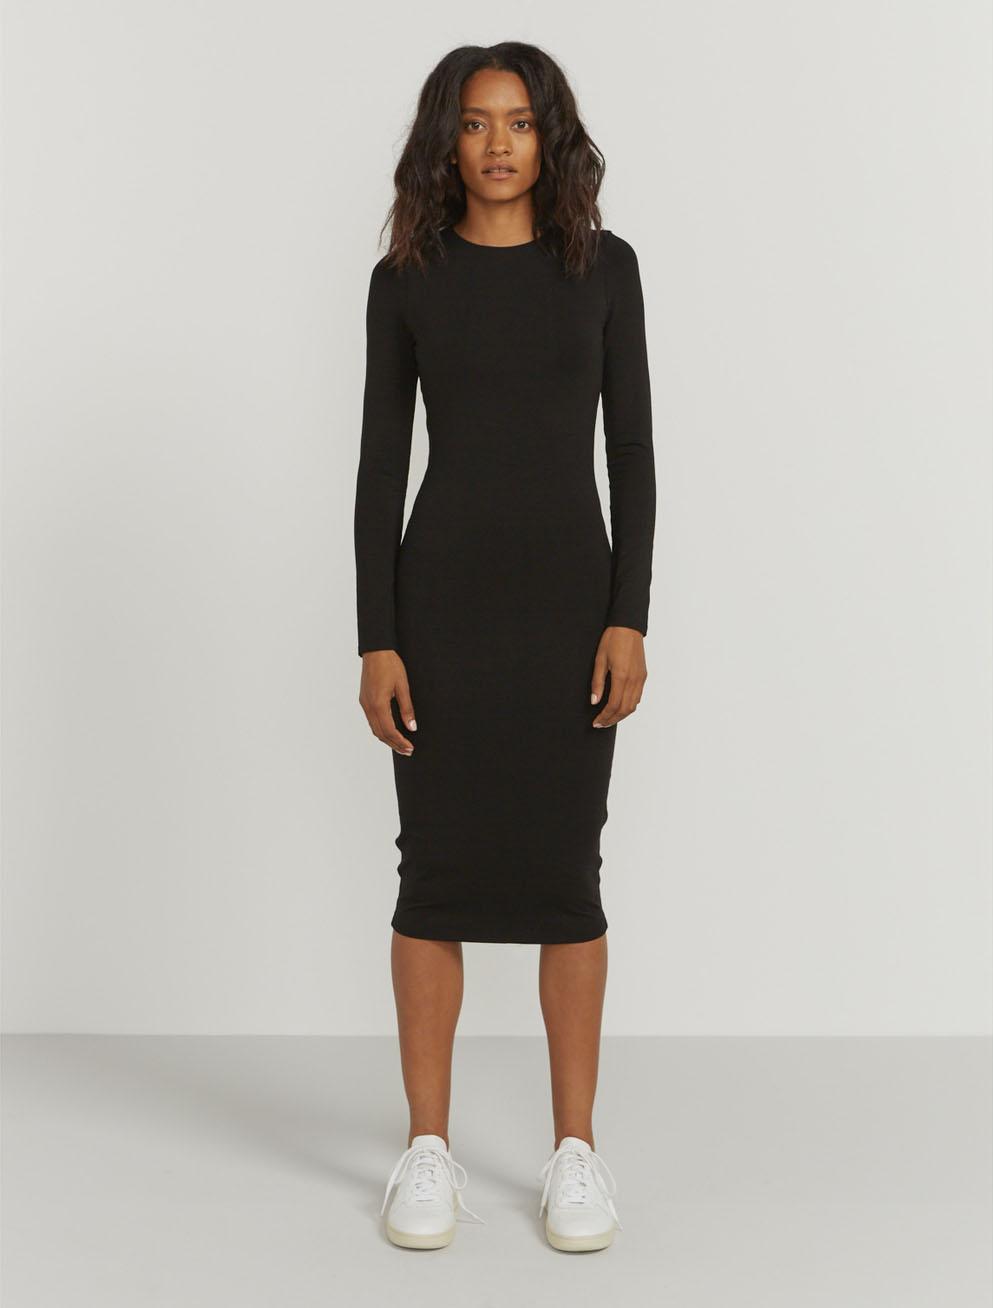 Pattyboutik Comfy Off Shoulder Long Sleeve Fitted Casual Dress Black S Long Sleeve Fitted Dress Black Long Sleeve Dress Casual Dresses [ 2000 x 1545 Pixel ]